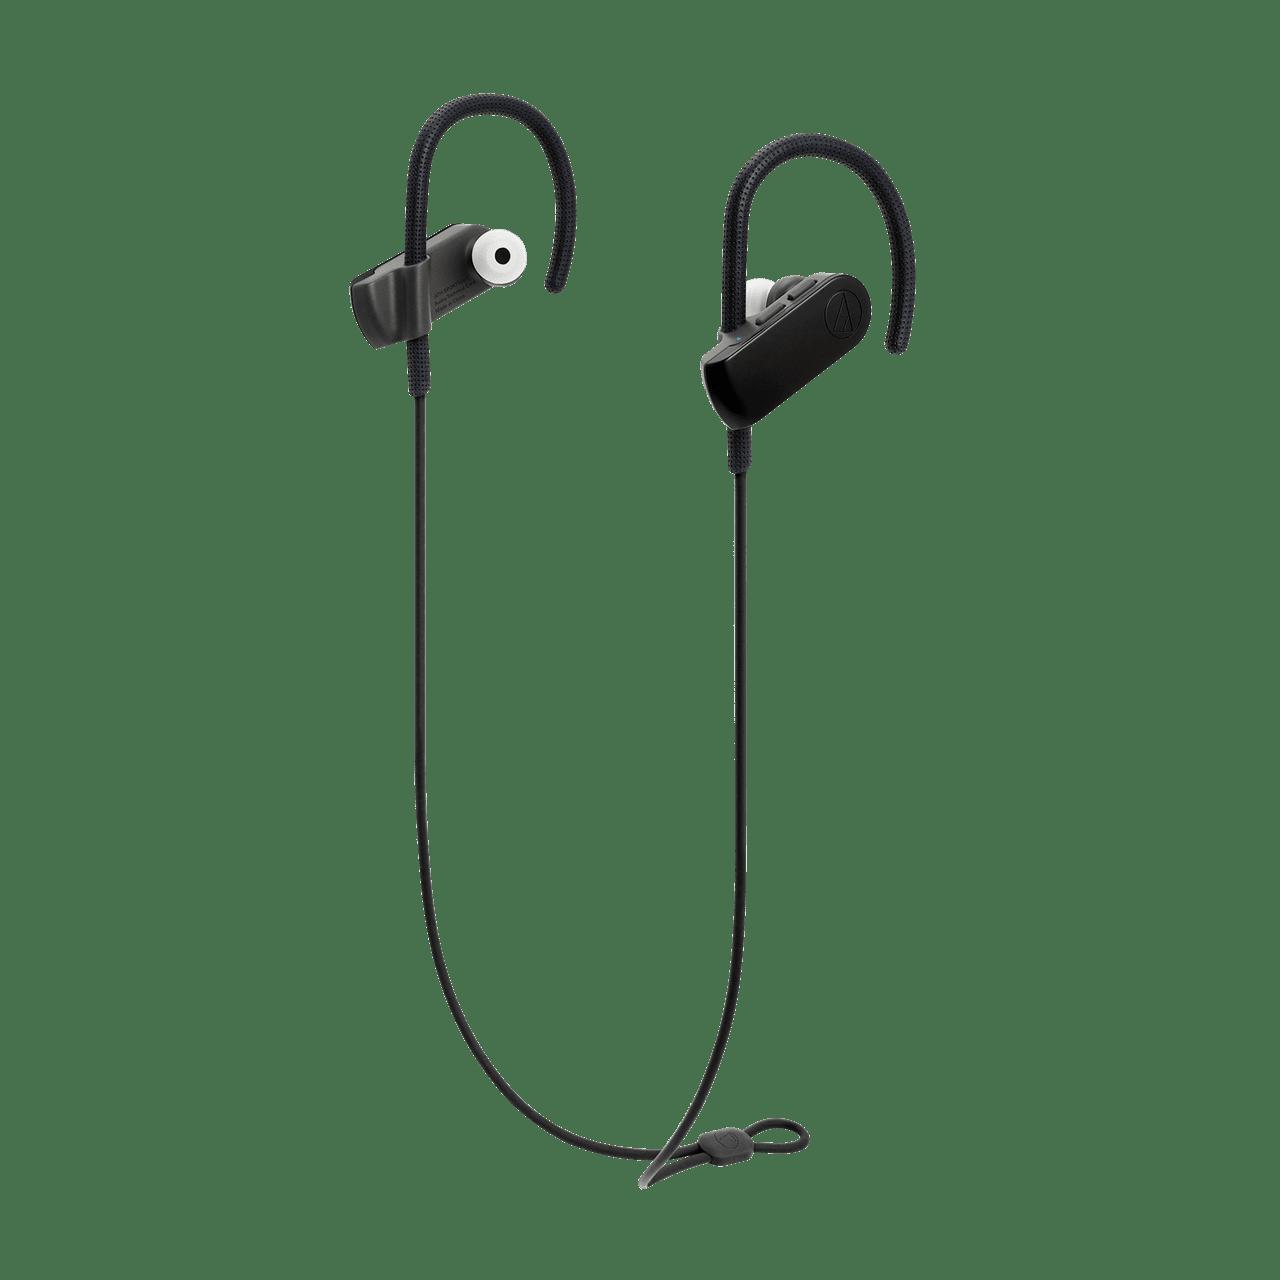 Audio Technica ATH-SPORT50BT SonicSport Black Bluetooth Headphones - 1